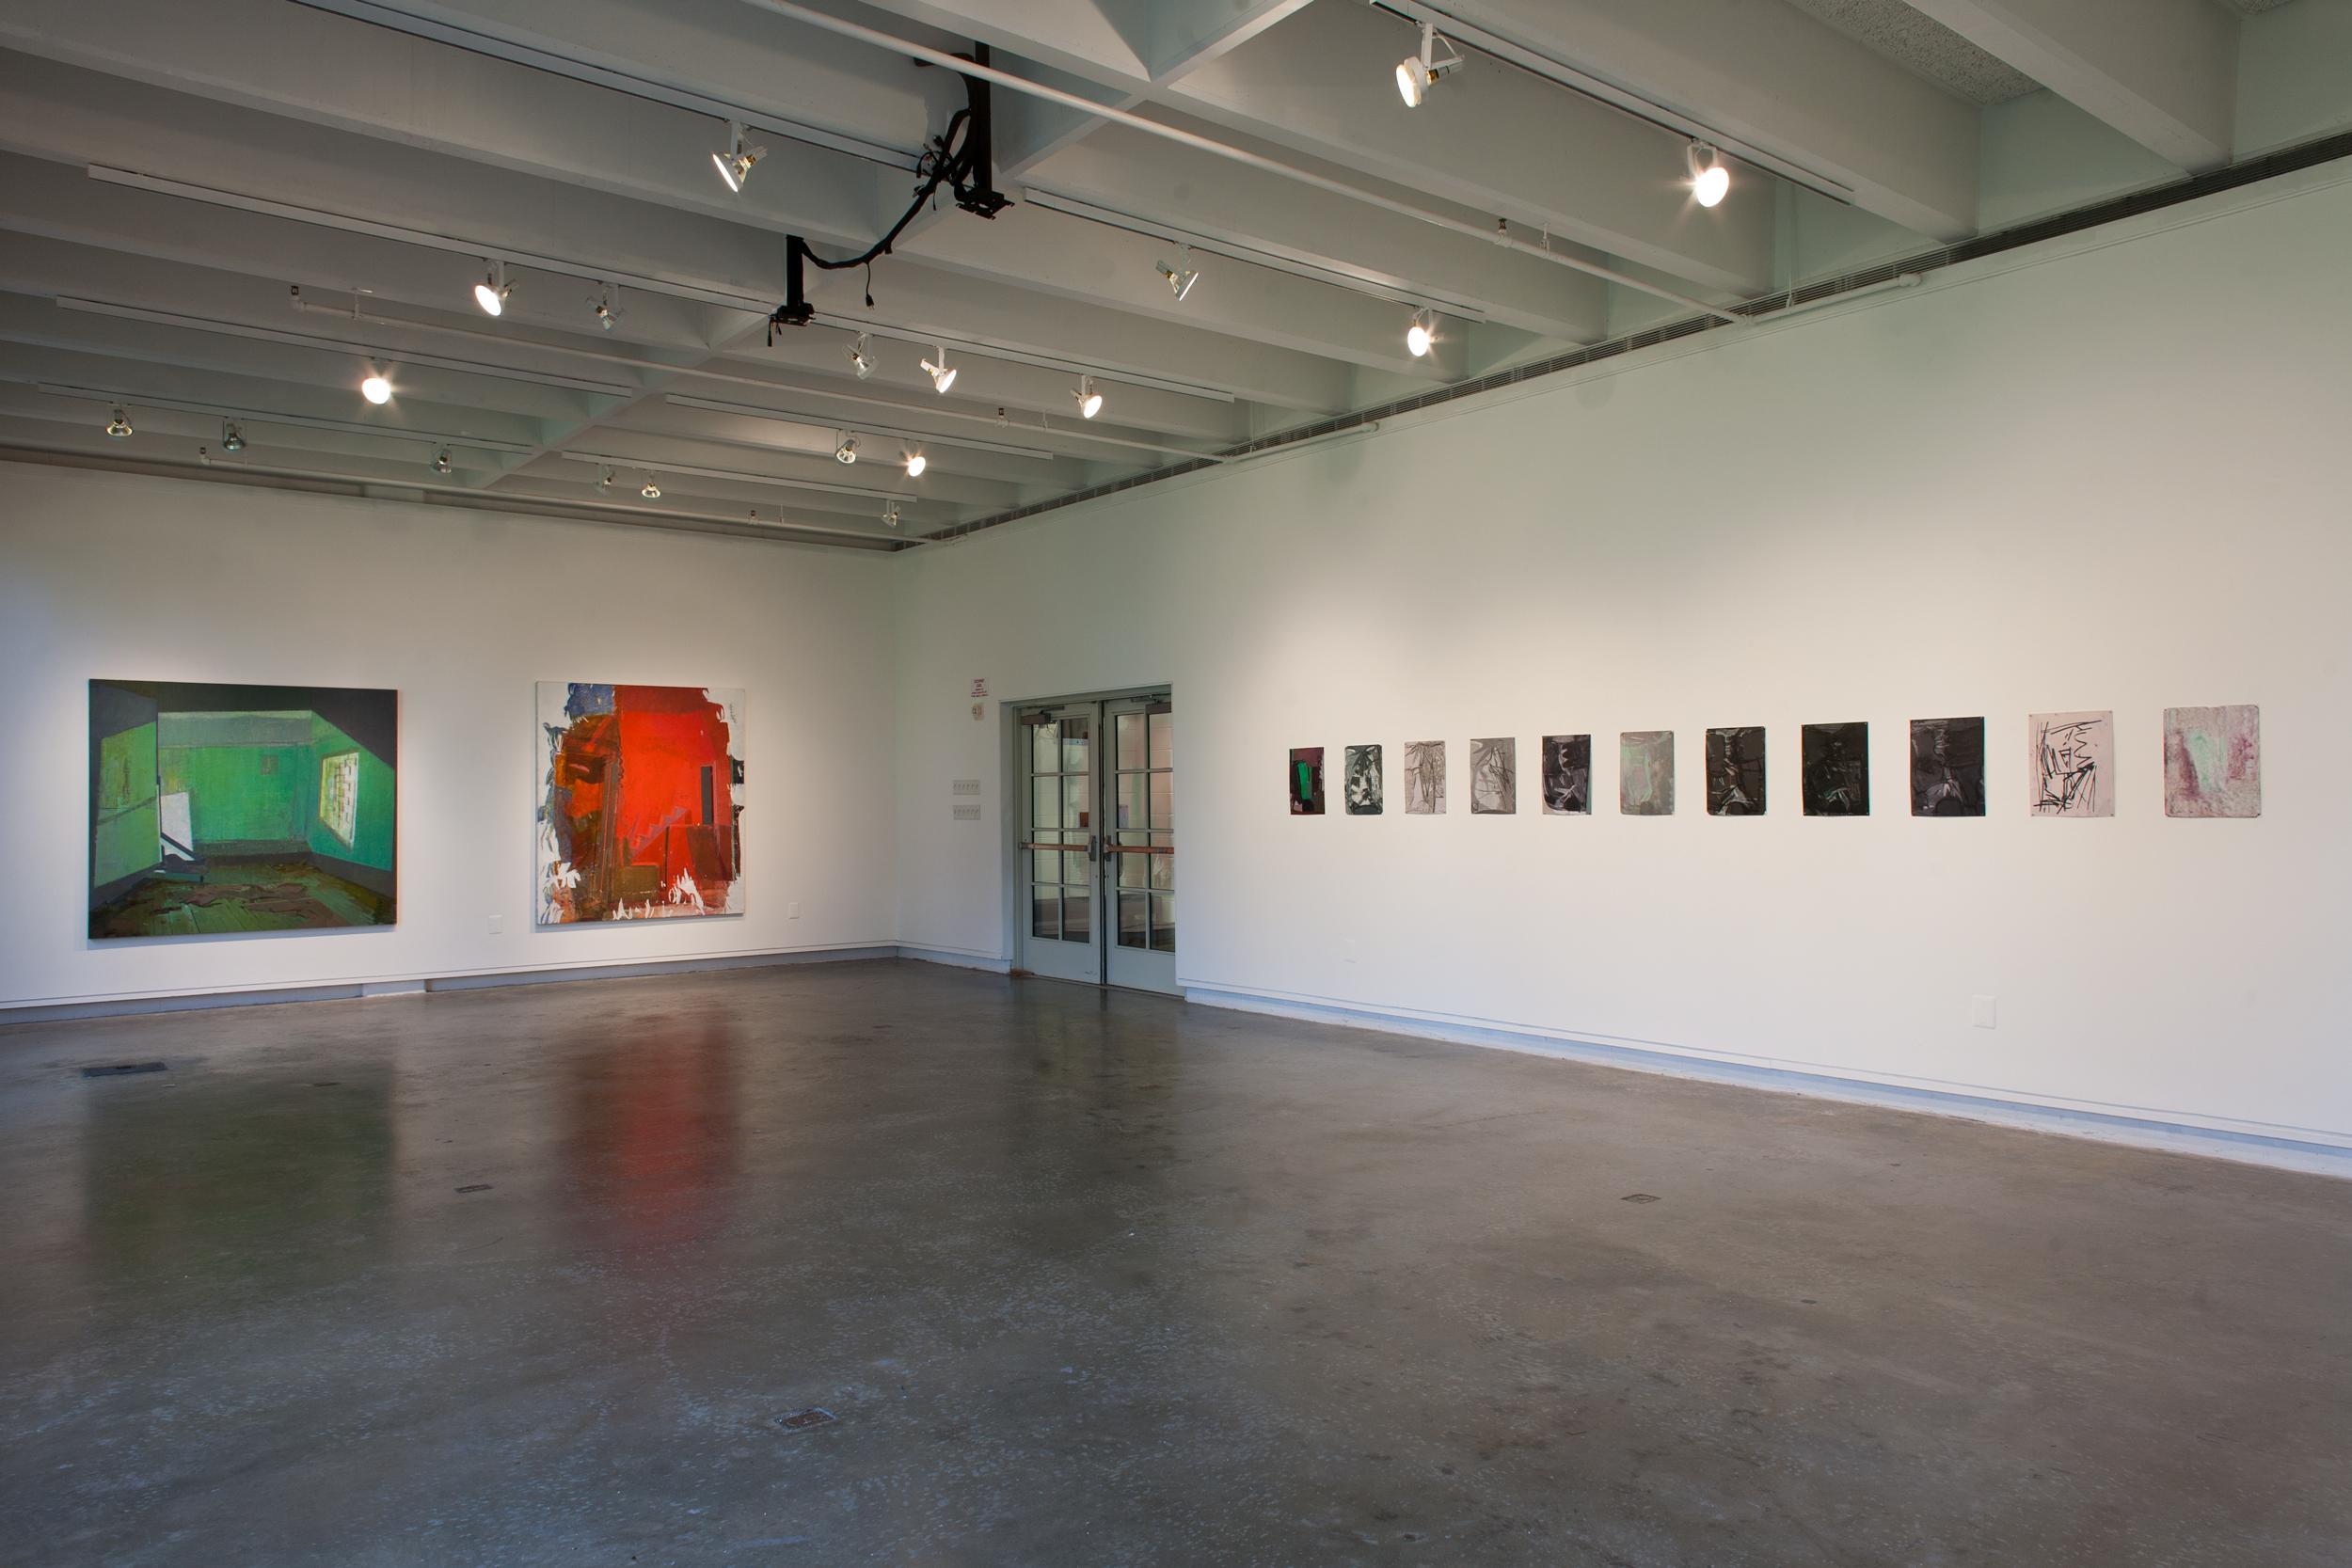 here (solo exhibition)  Aug 30 - Oct 7, 2016 Korn Gallery Drew University, Madison, NJ